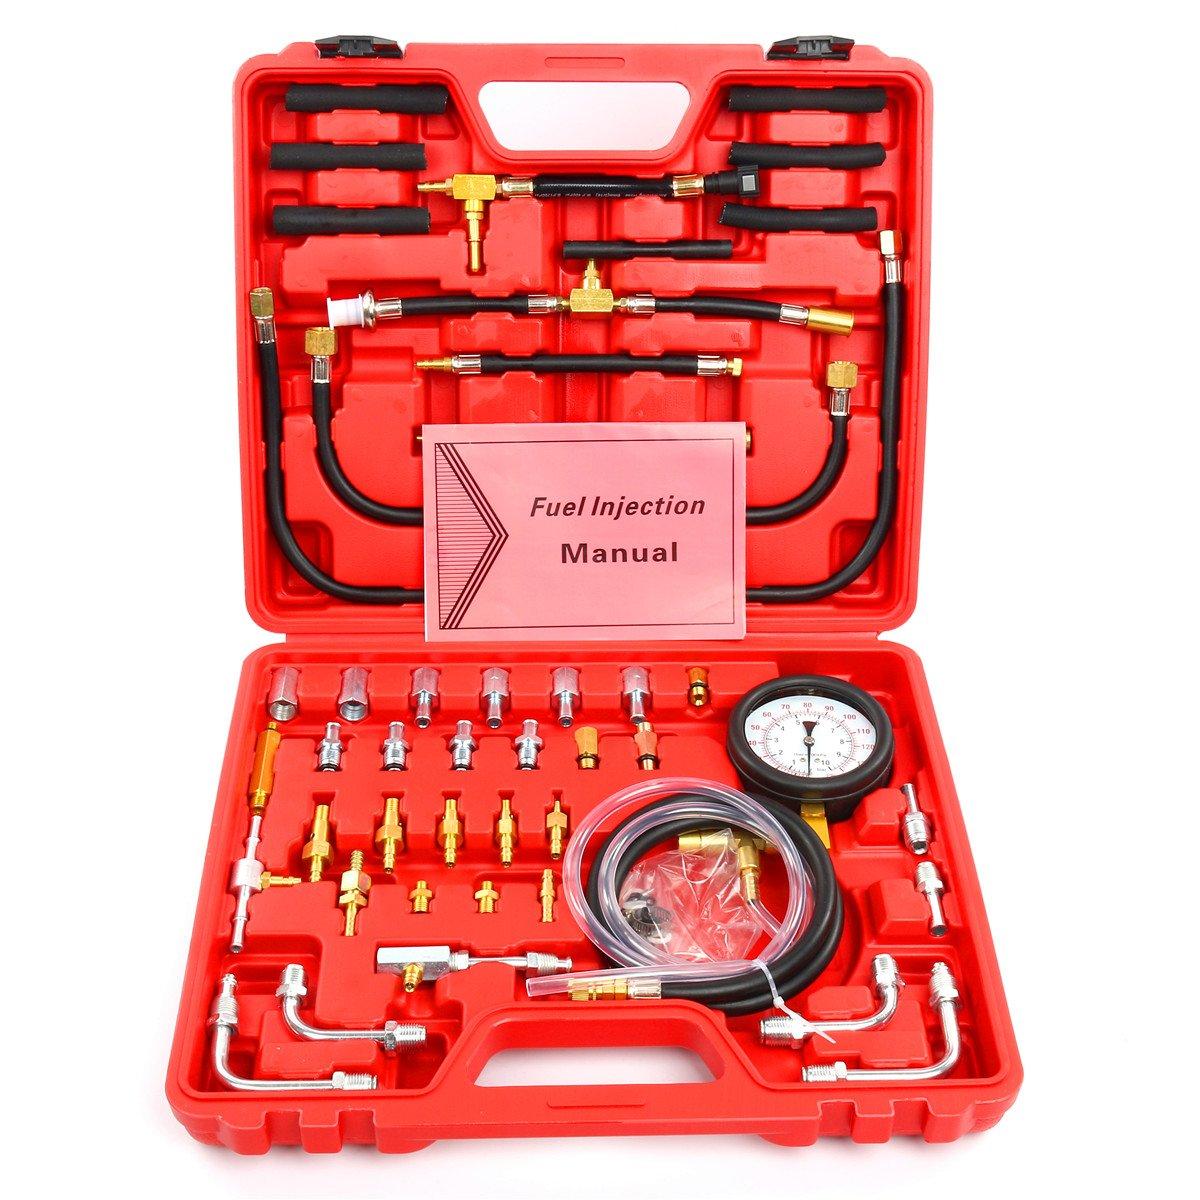 FreeTec Pro Oil Fuel Injection Pressure Tester Tool freebirdtrading